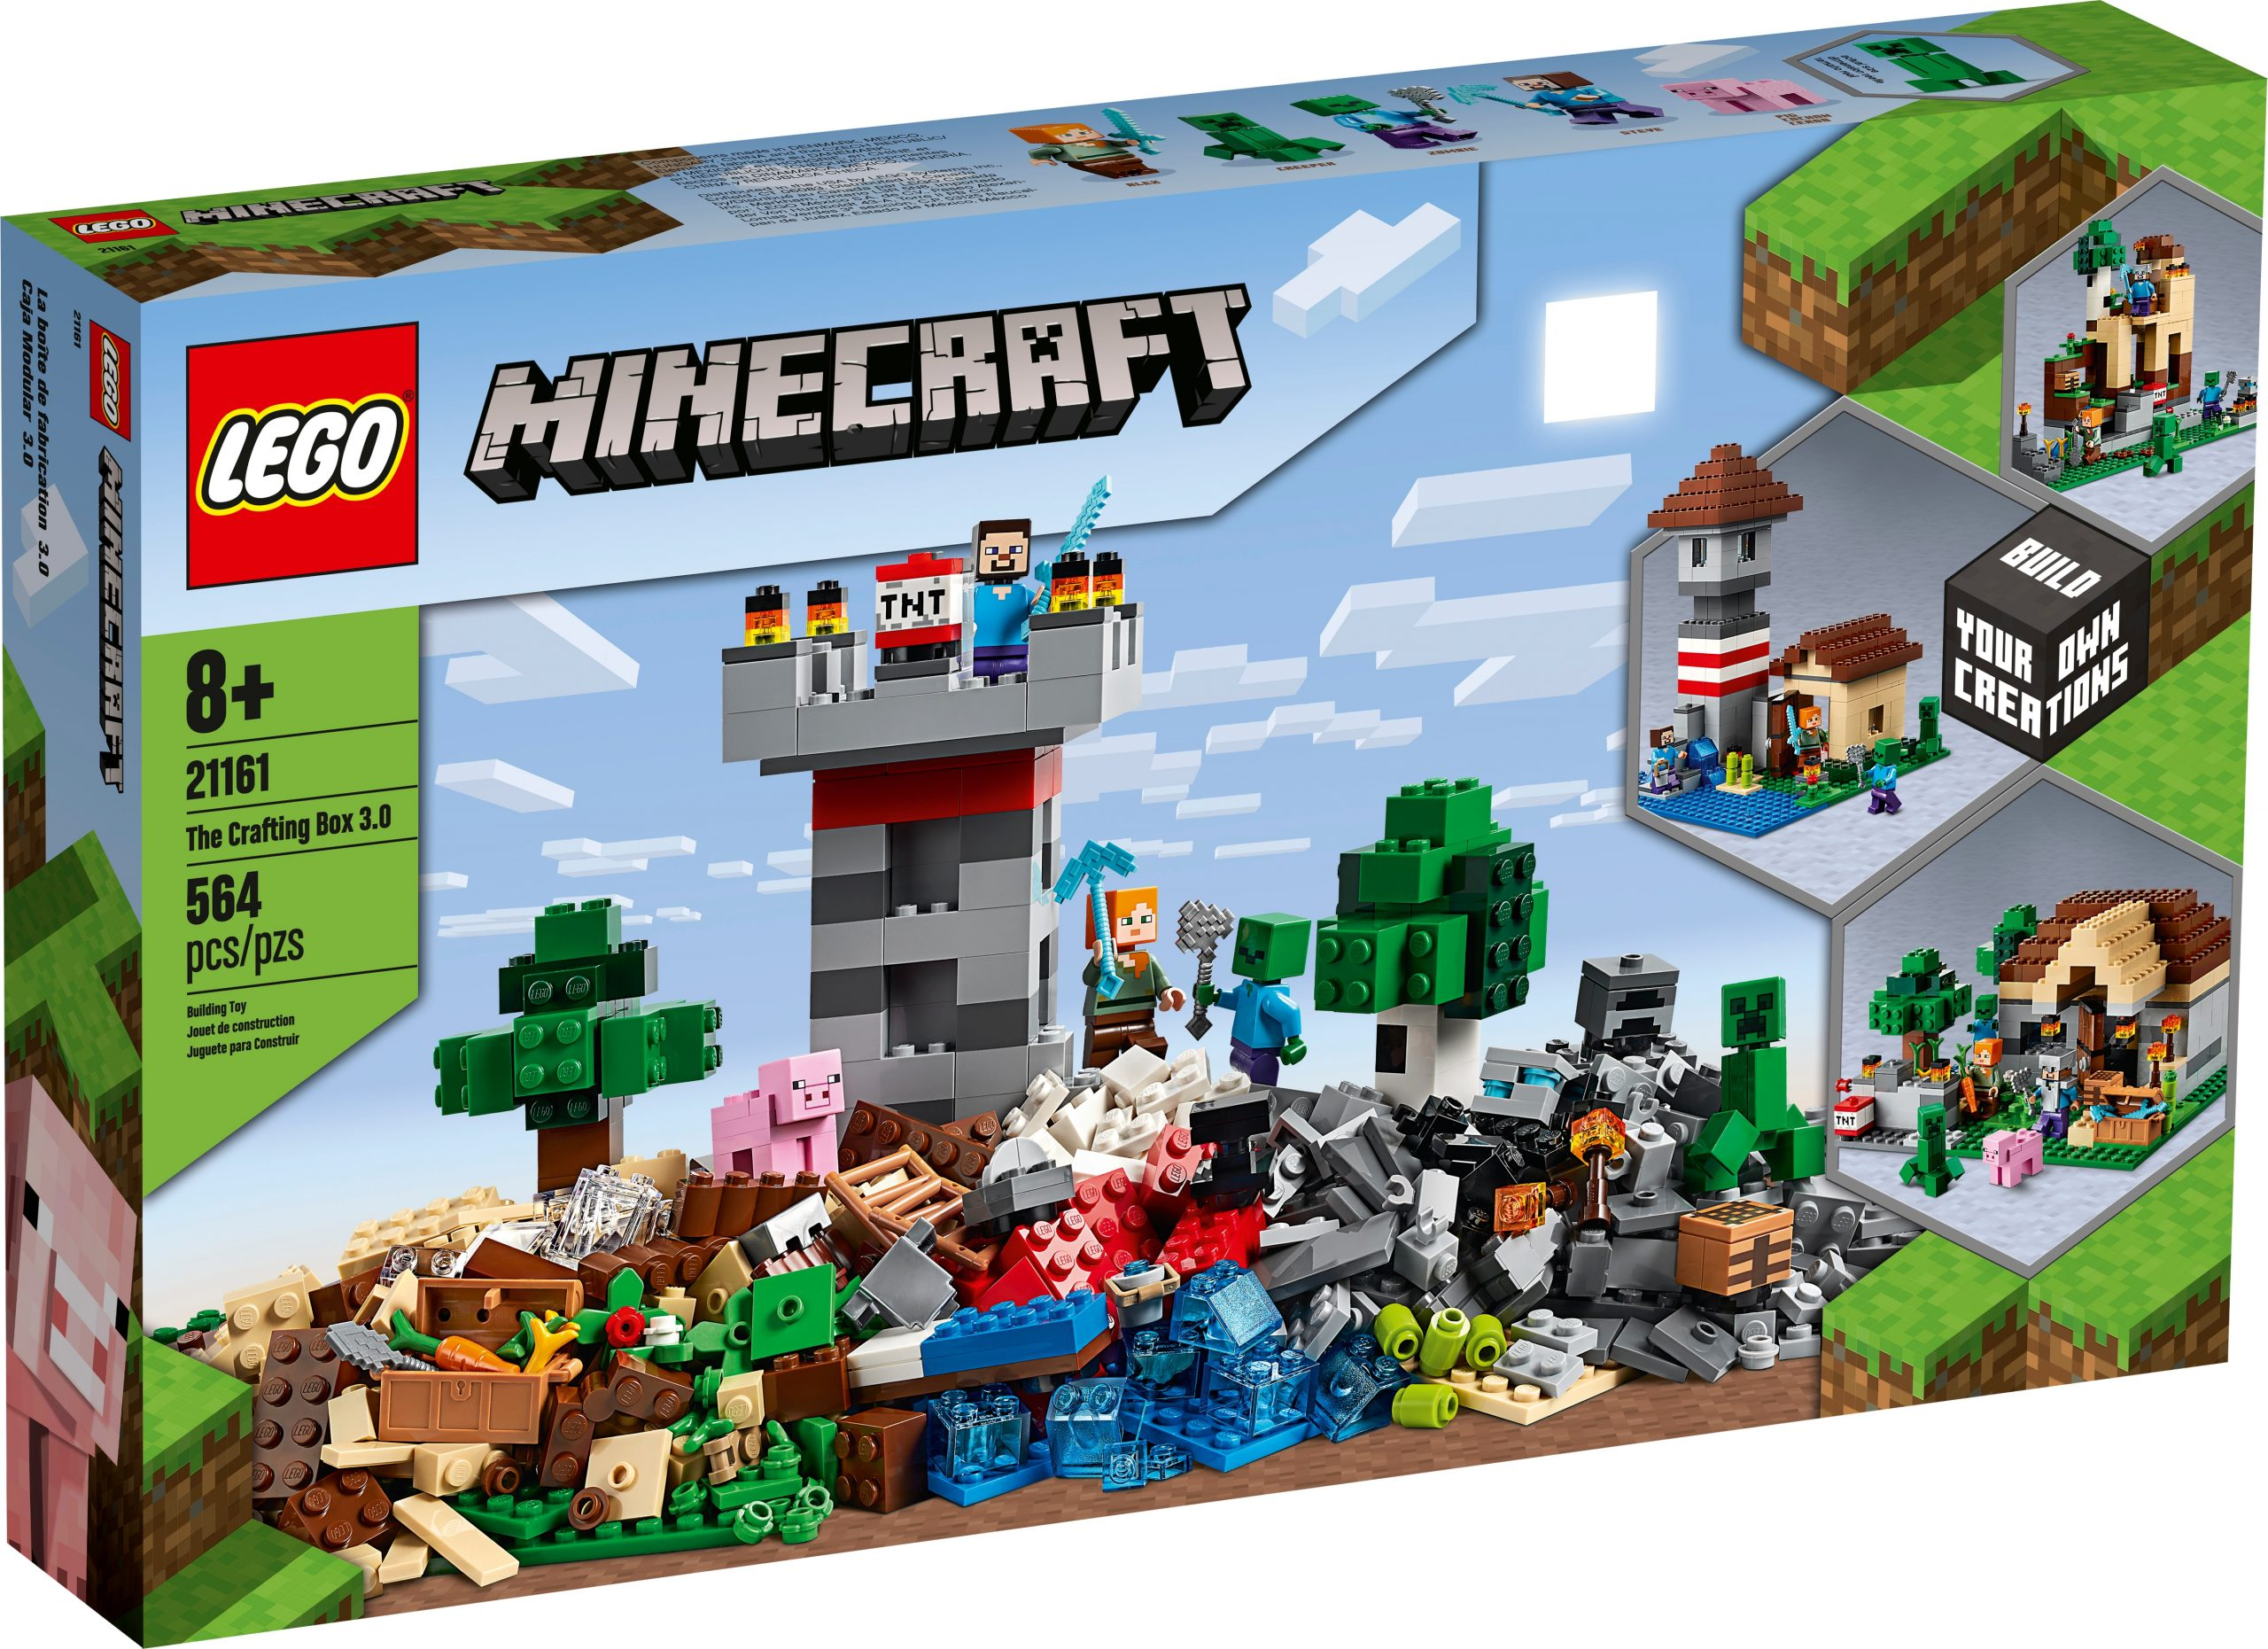 lego 21161 the crafting box 3 0 scaled